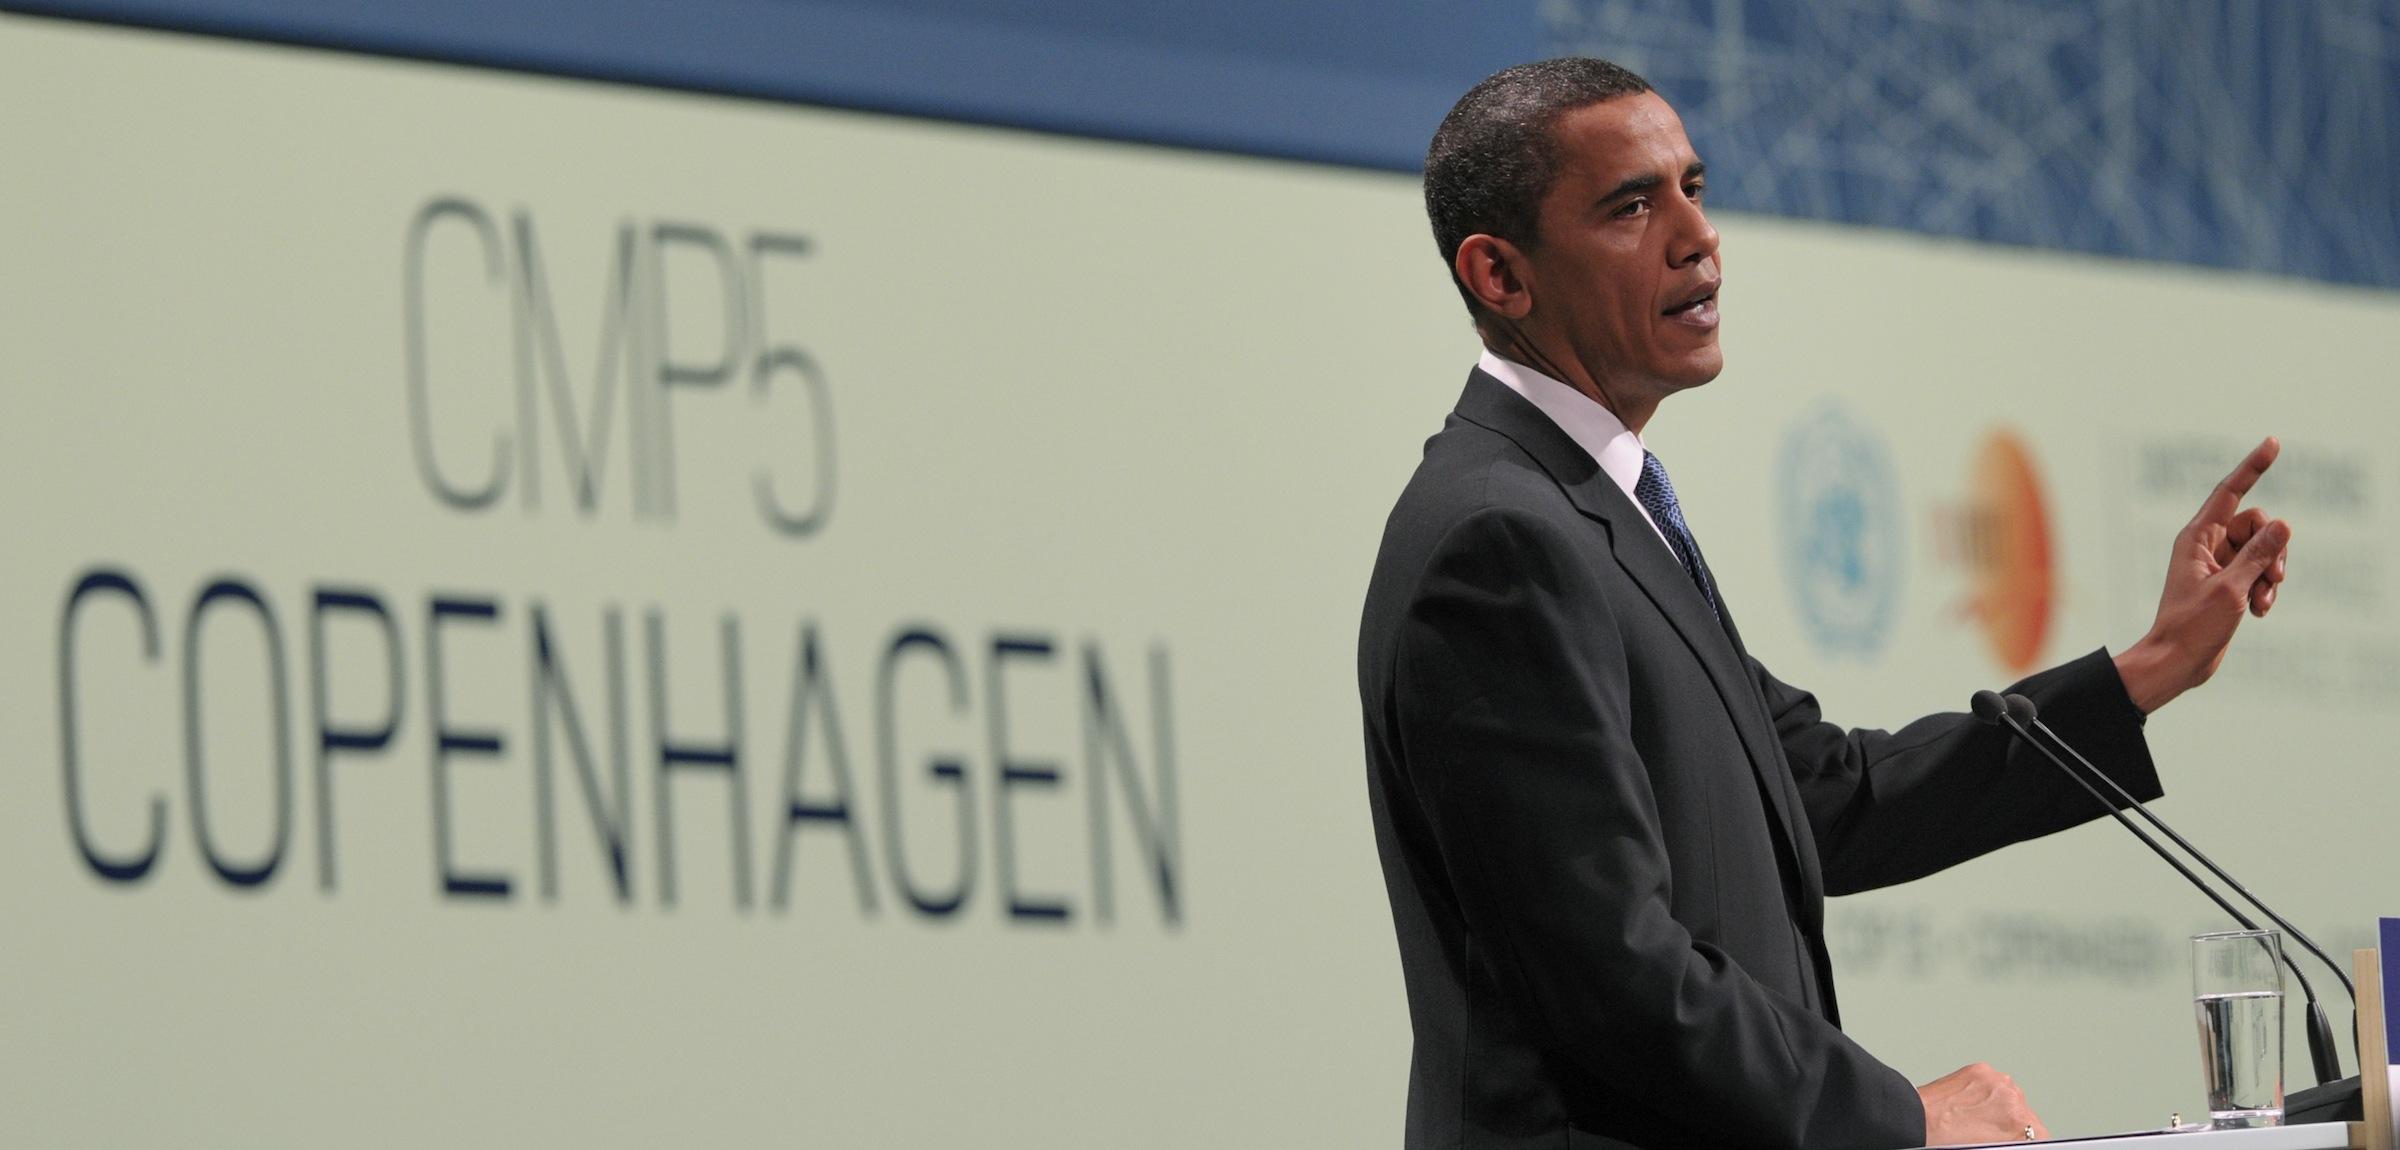 Barack Obama in Copenhagen